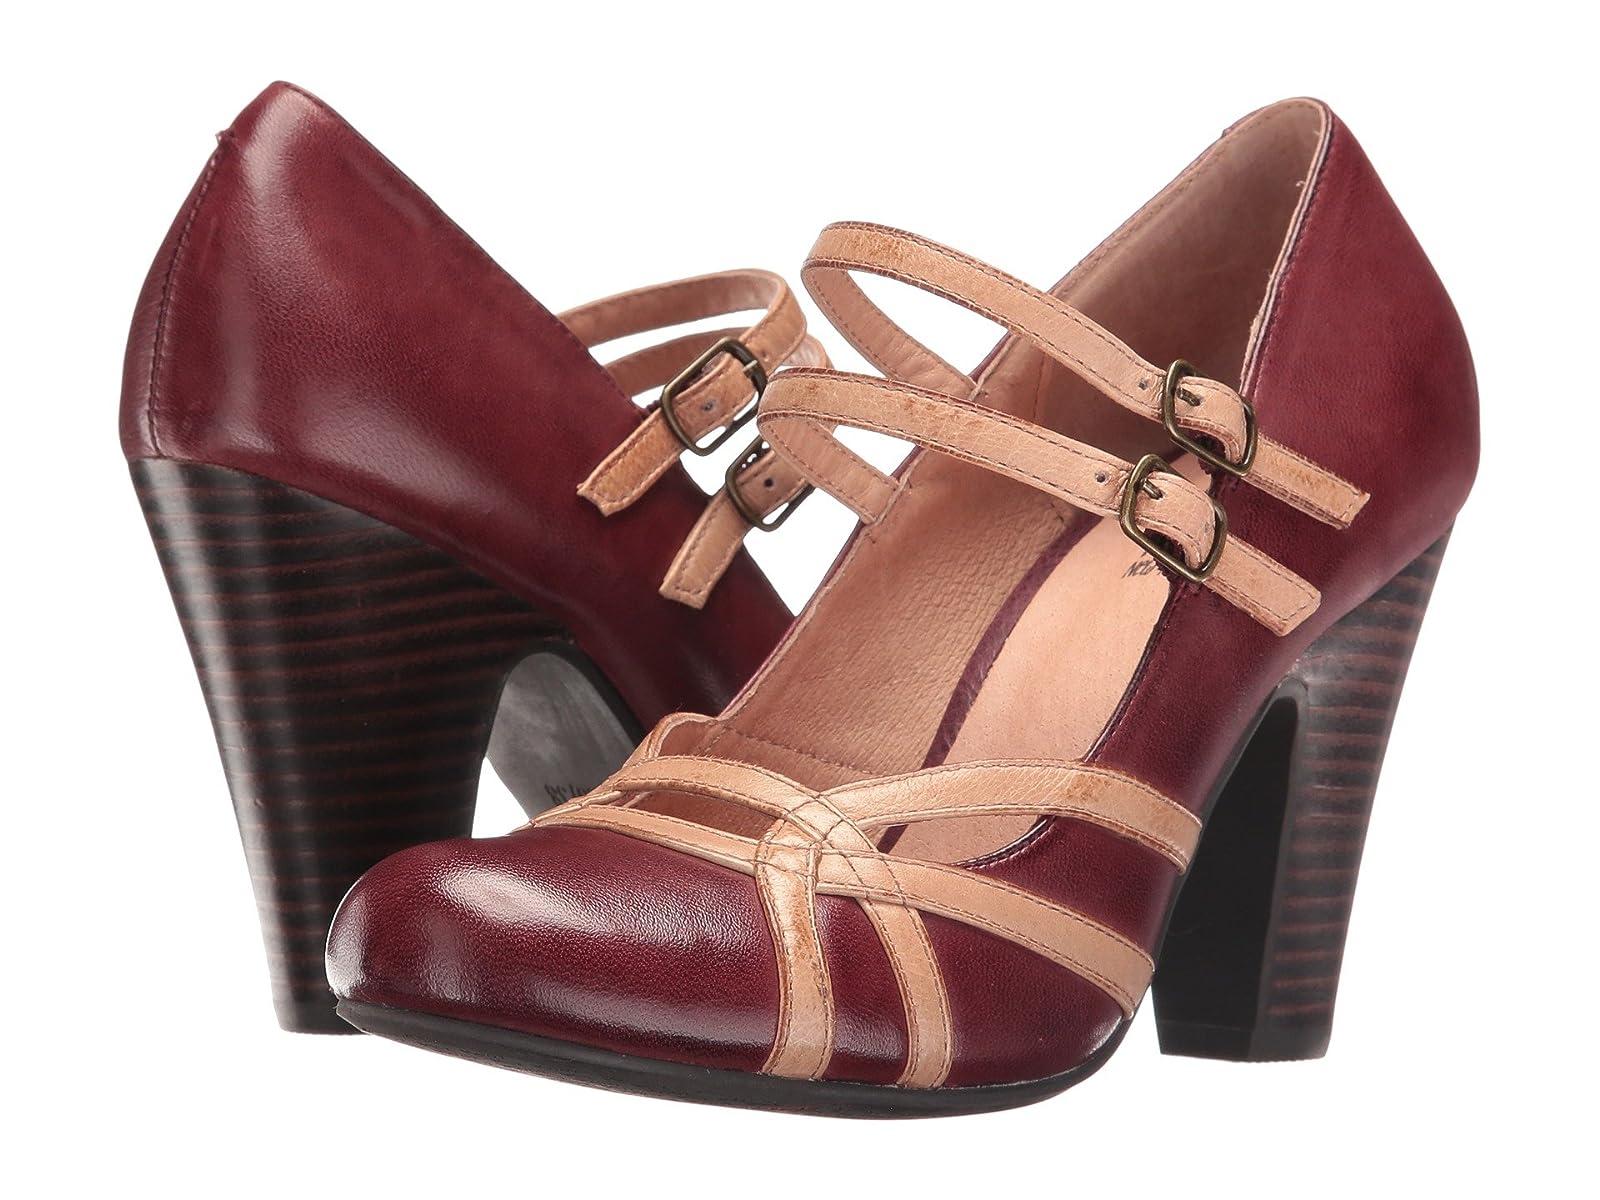 Miz Mooz NaokiCheap and distinctive eye-catching shoes